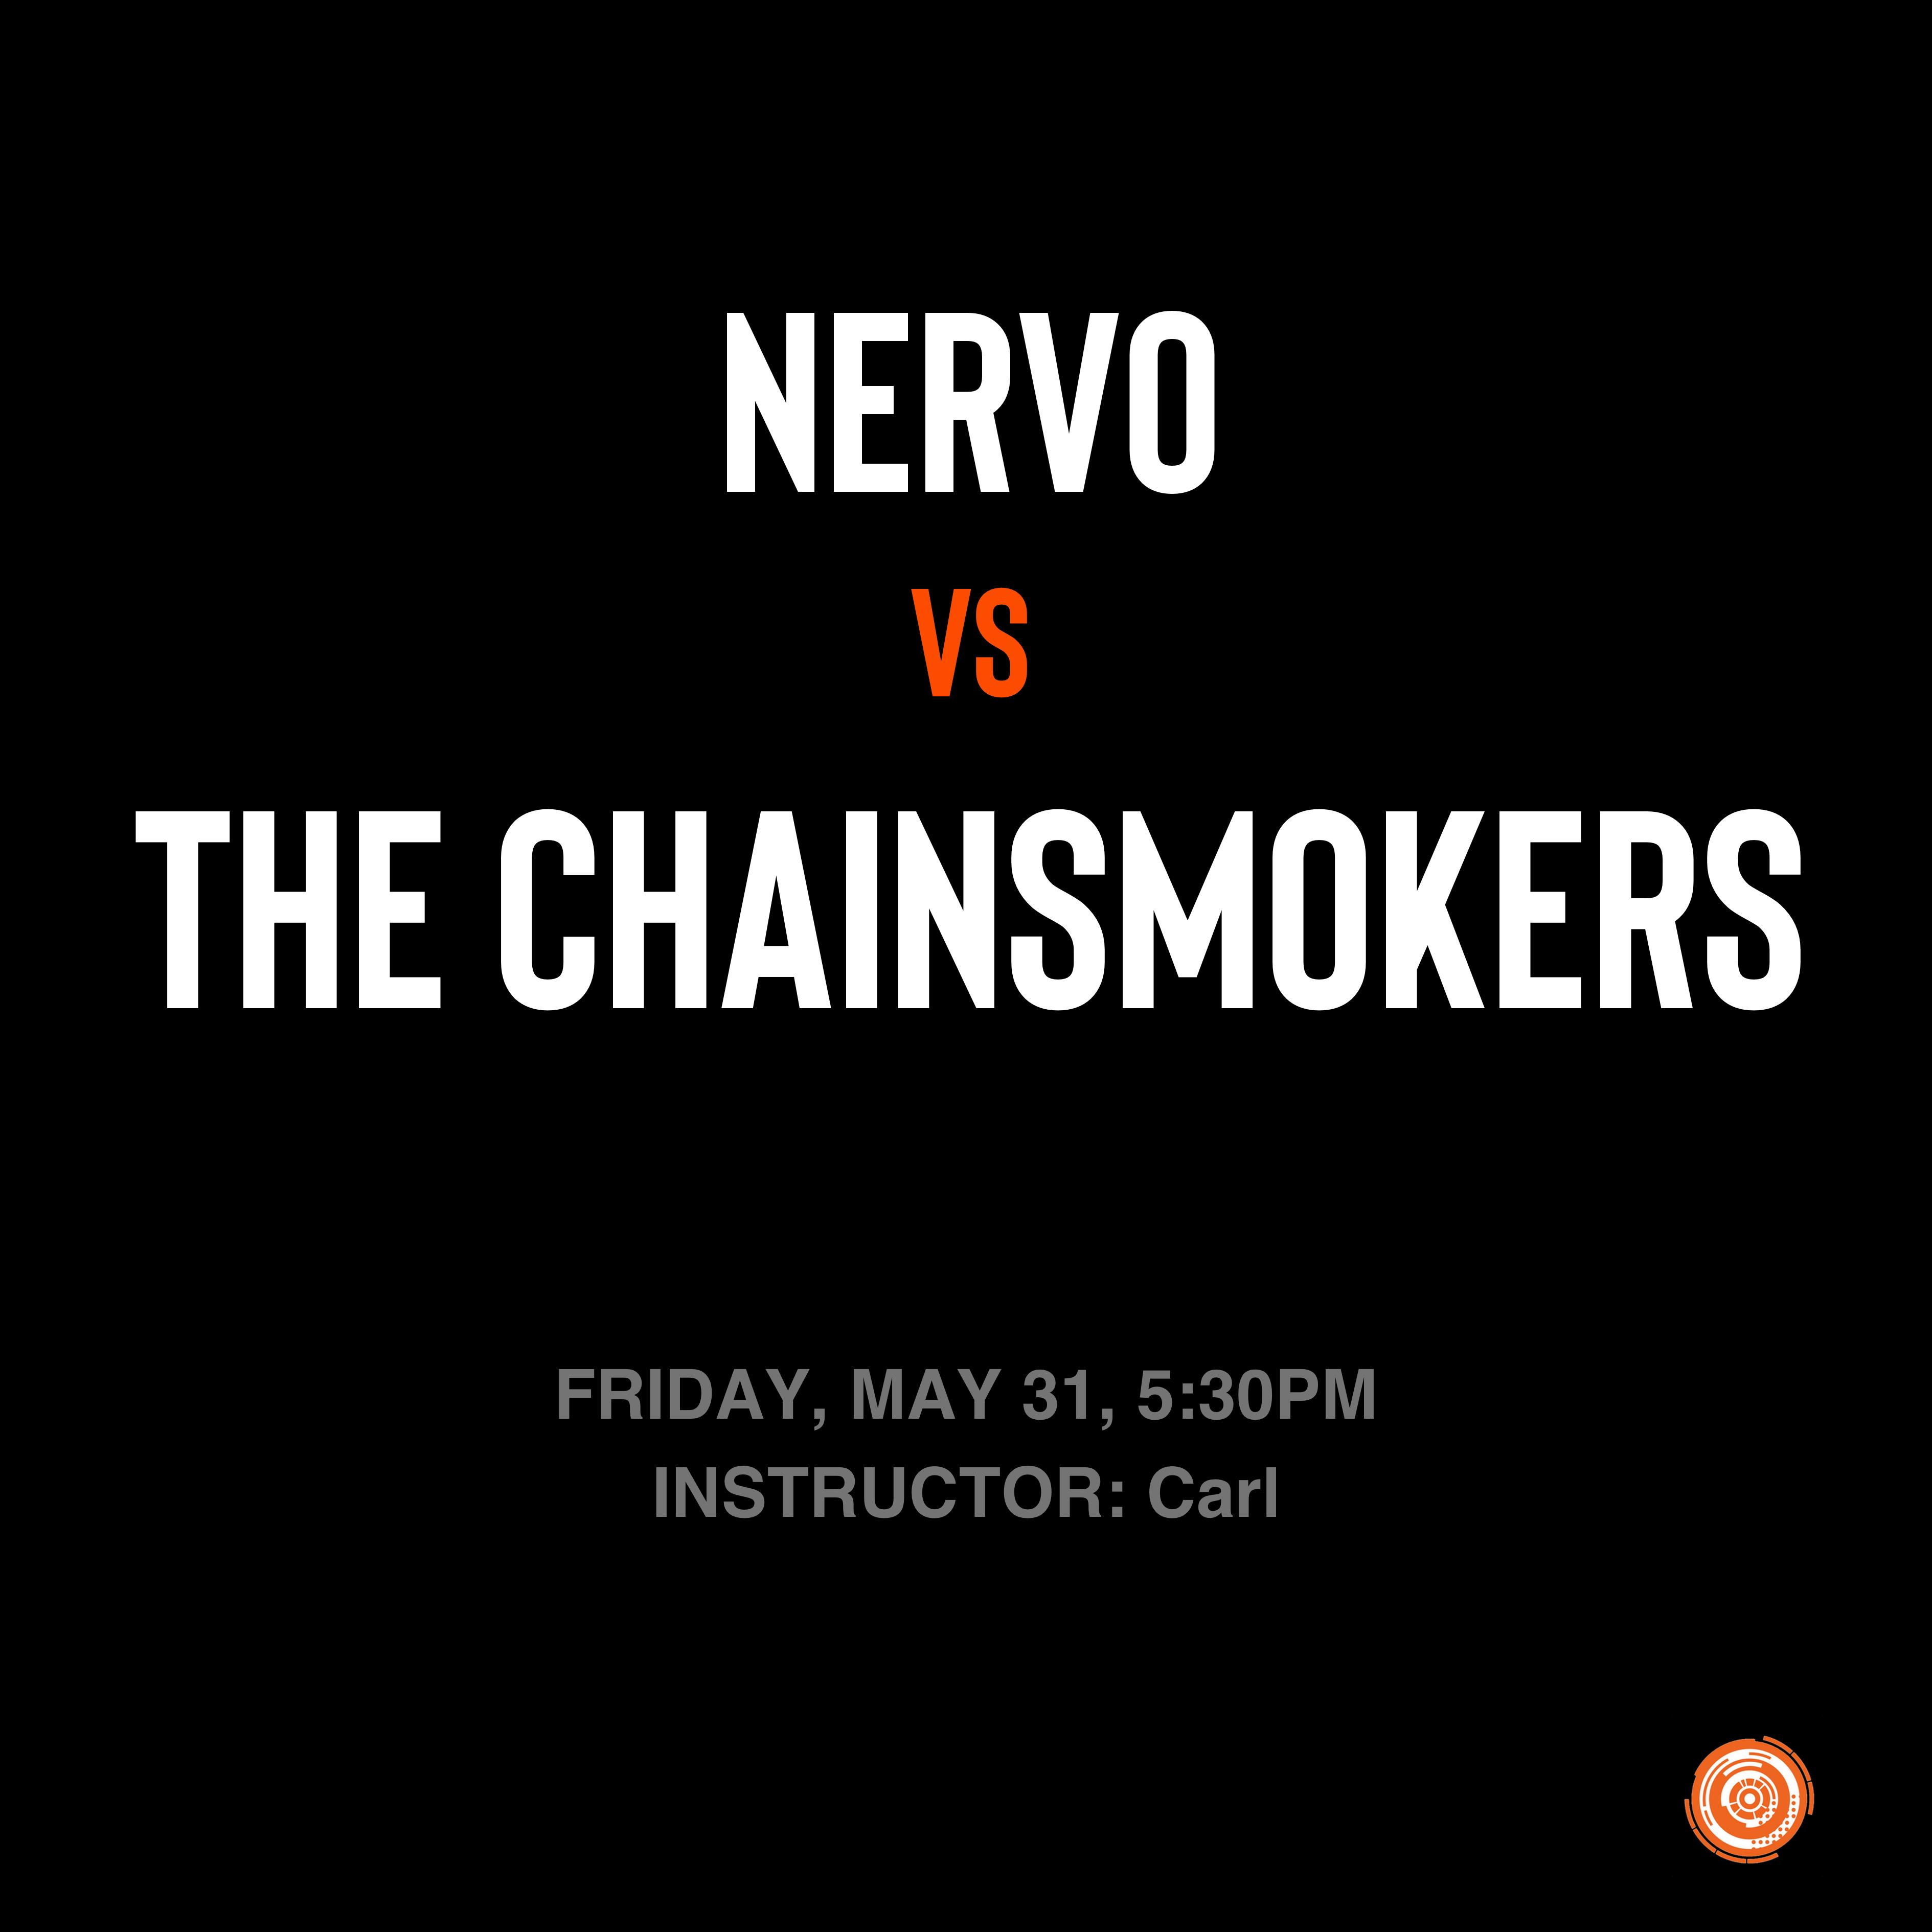 Nervo vs The Chainsmokers